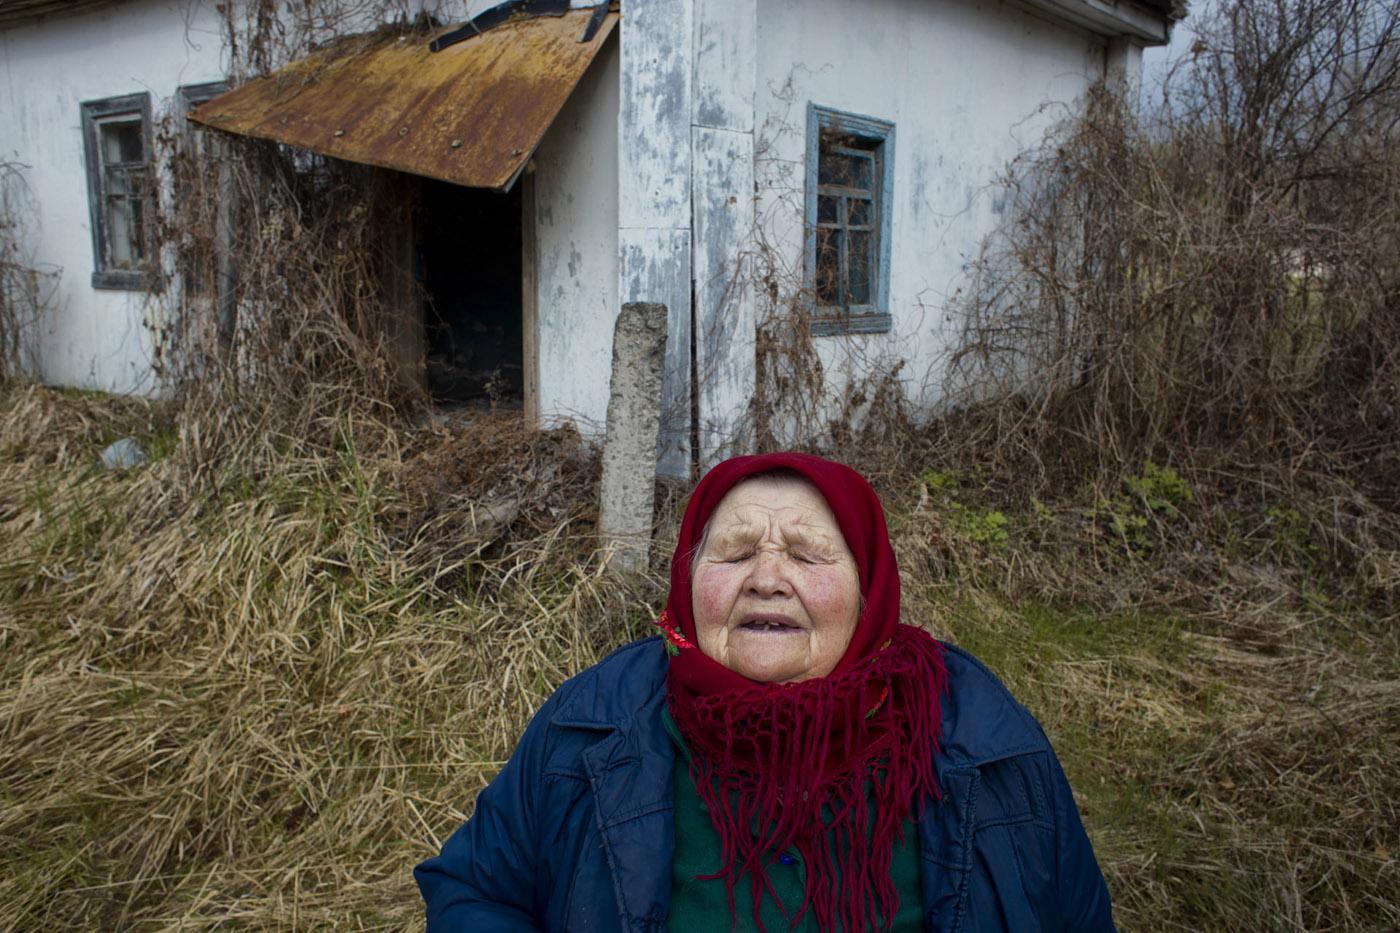 Anastasiya Patukh is seen in front of her house in Paryshiv - half abandoned village inside the Chernobyl's exclusion zone. Now she lives in Kovaln village. Photo by Maciek Nabrdalik / VII.